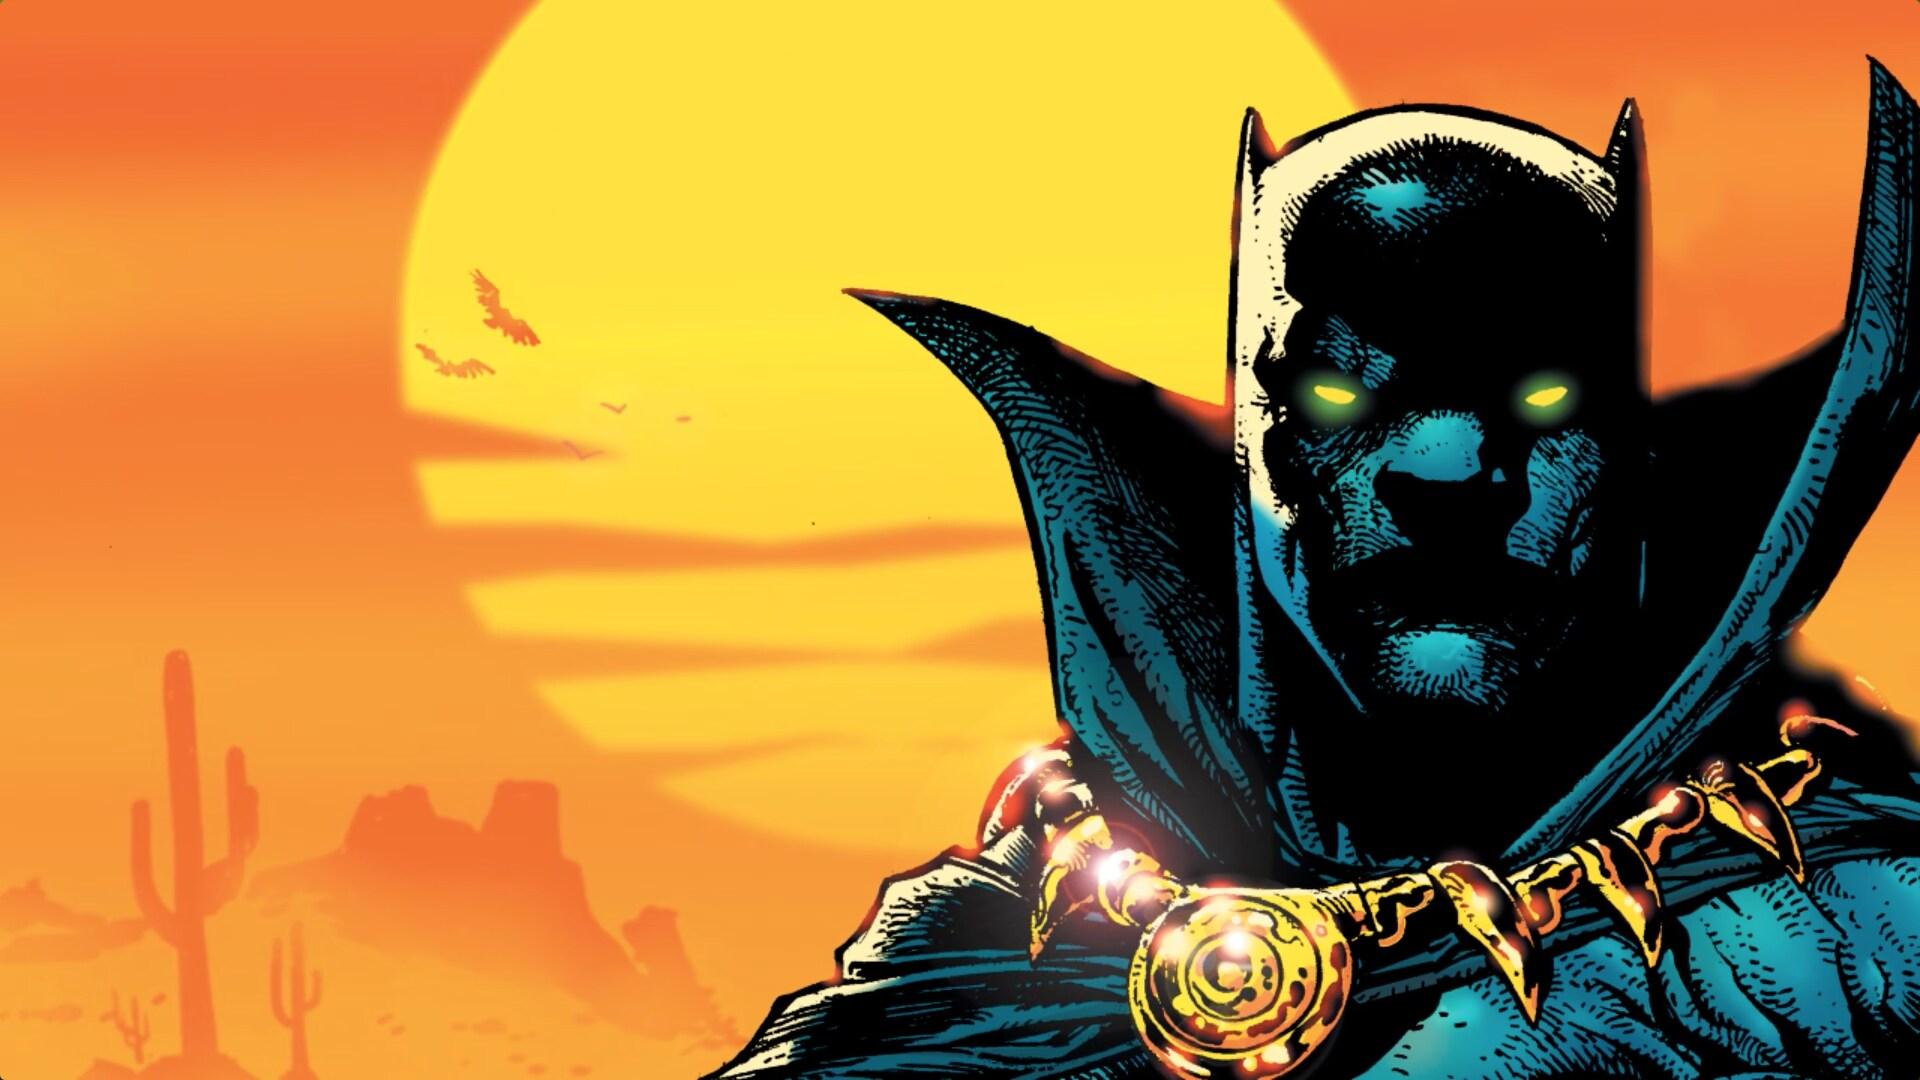 Pantera Negra - Heróis em um minuto